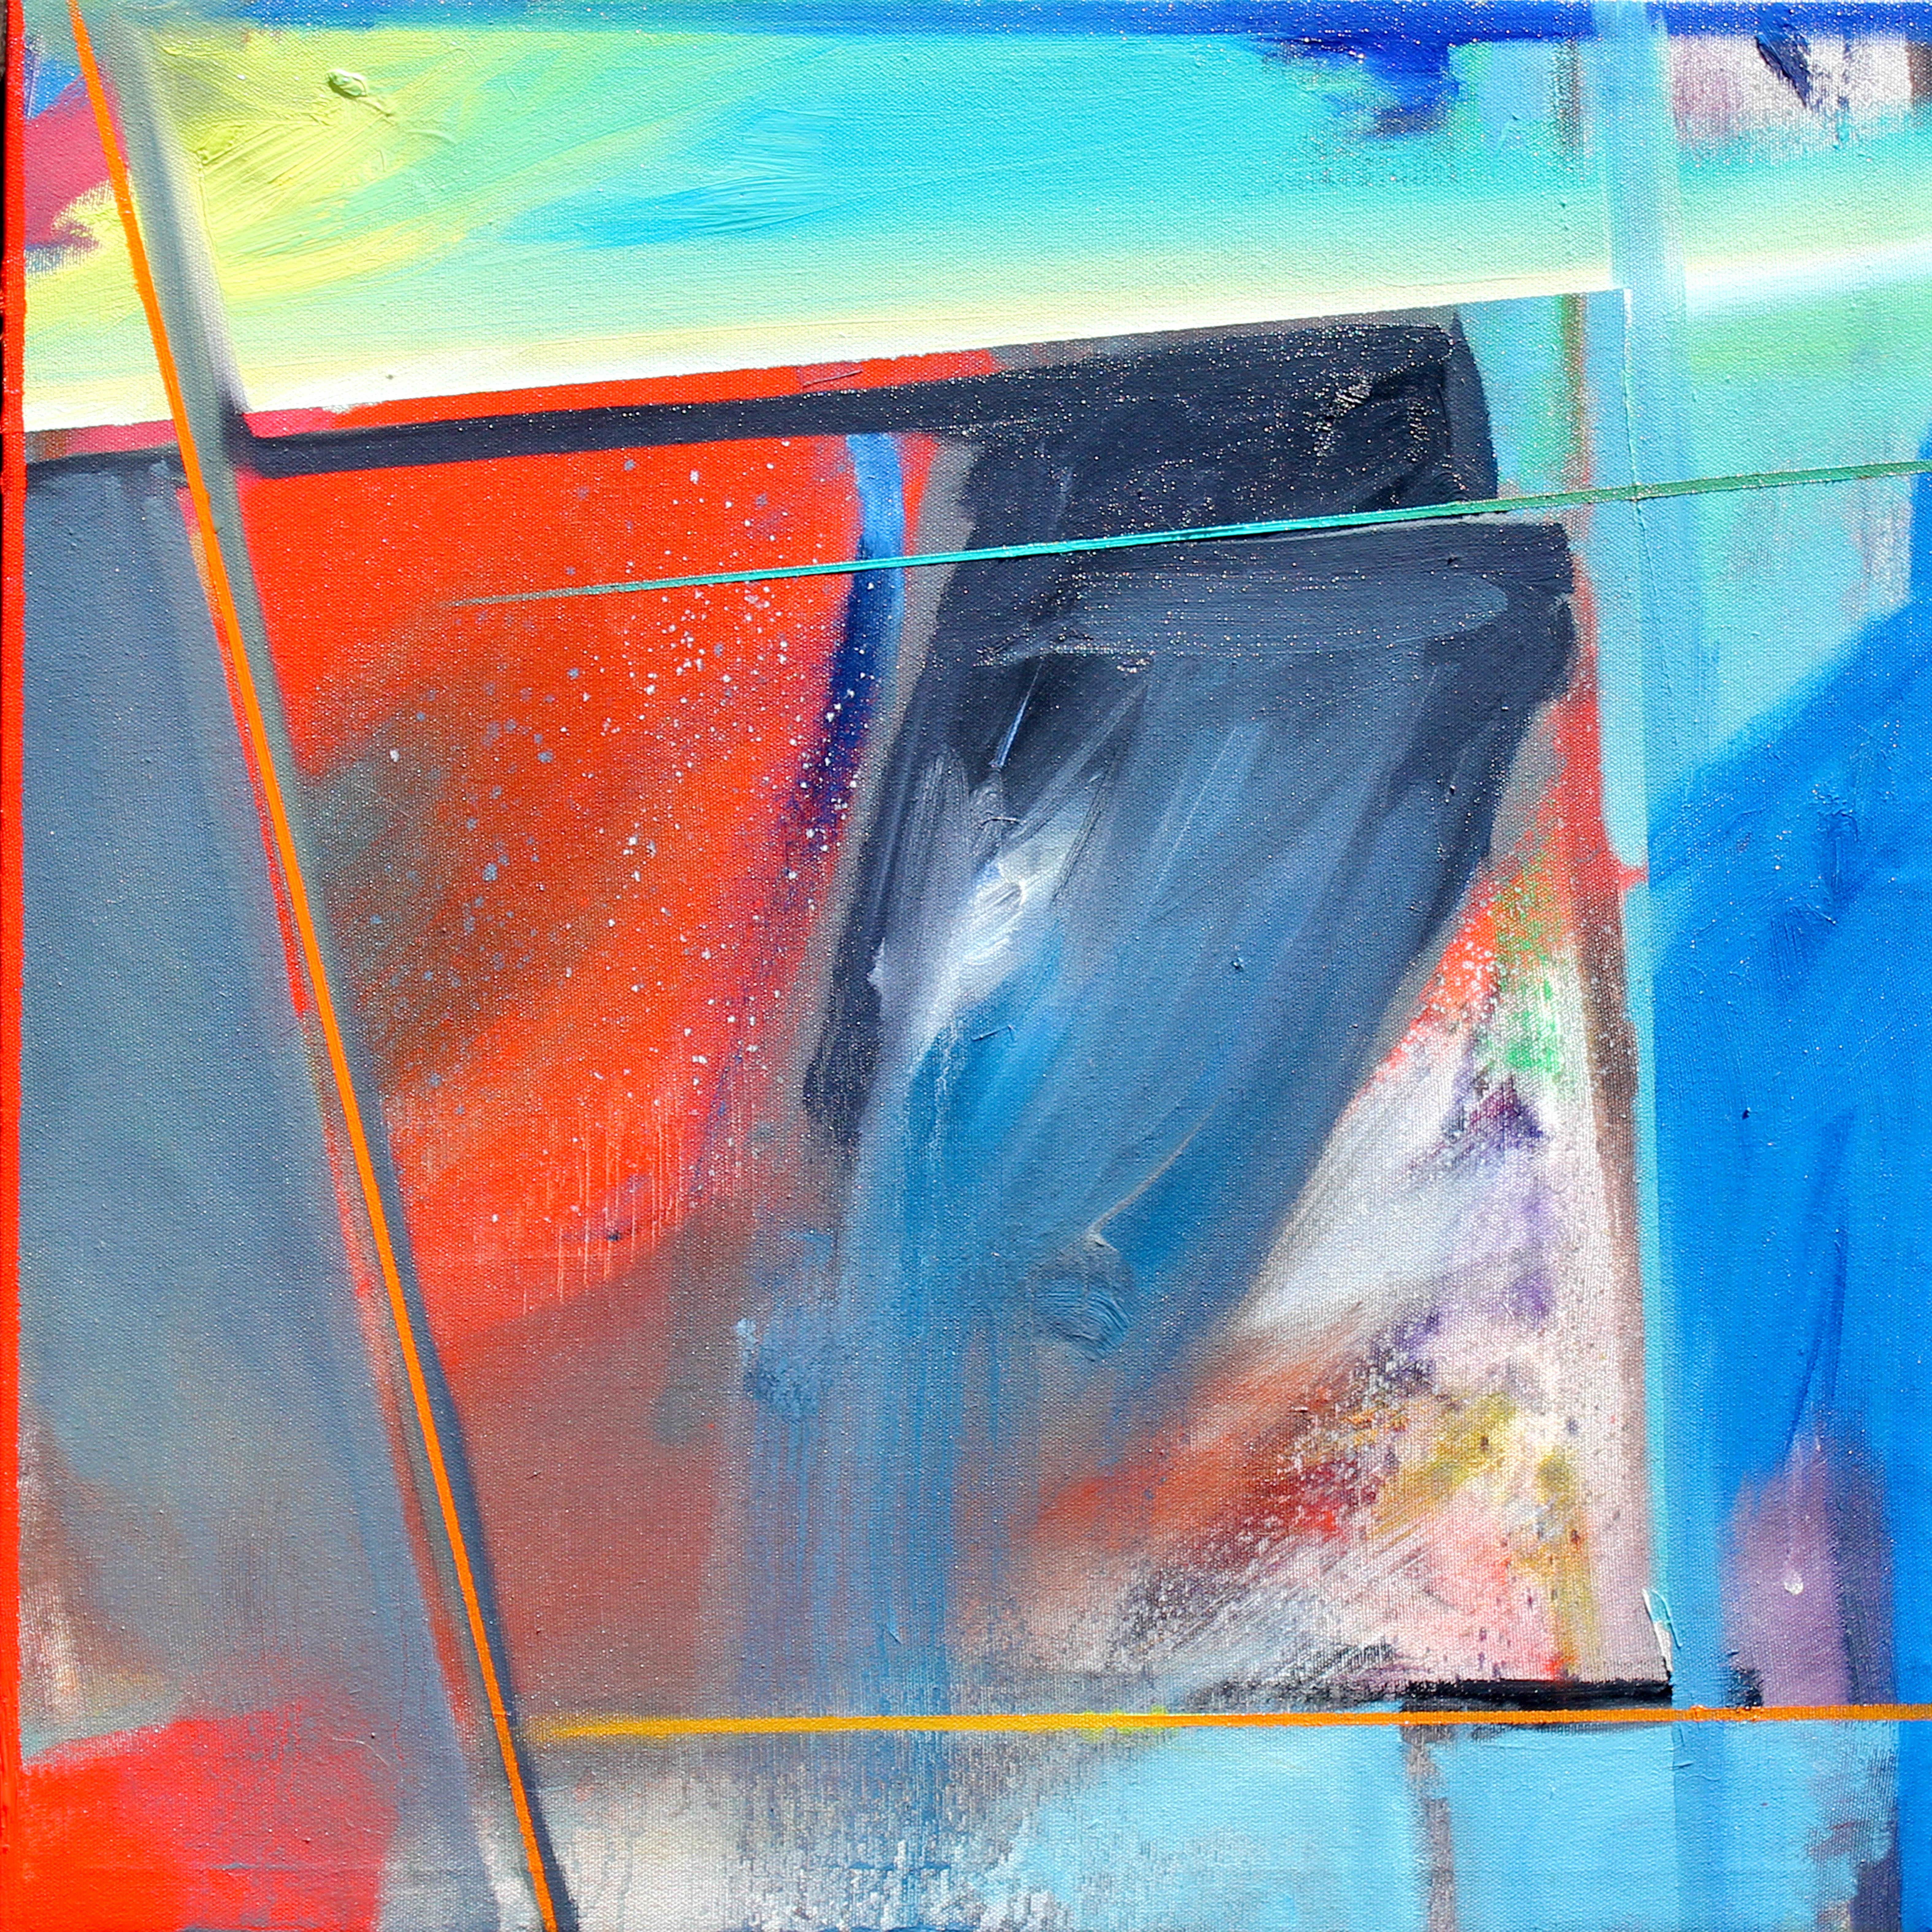 Method and Season No. 8 21x21 Oil on Canvas Phillip Potter